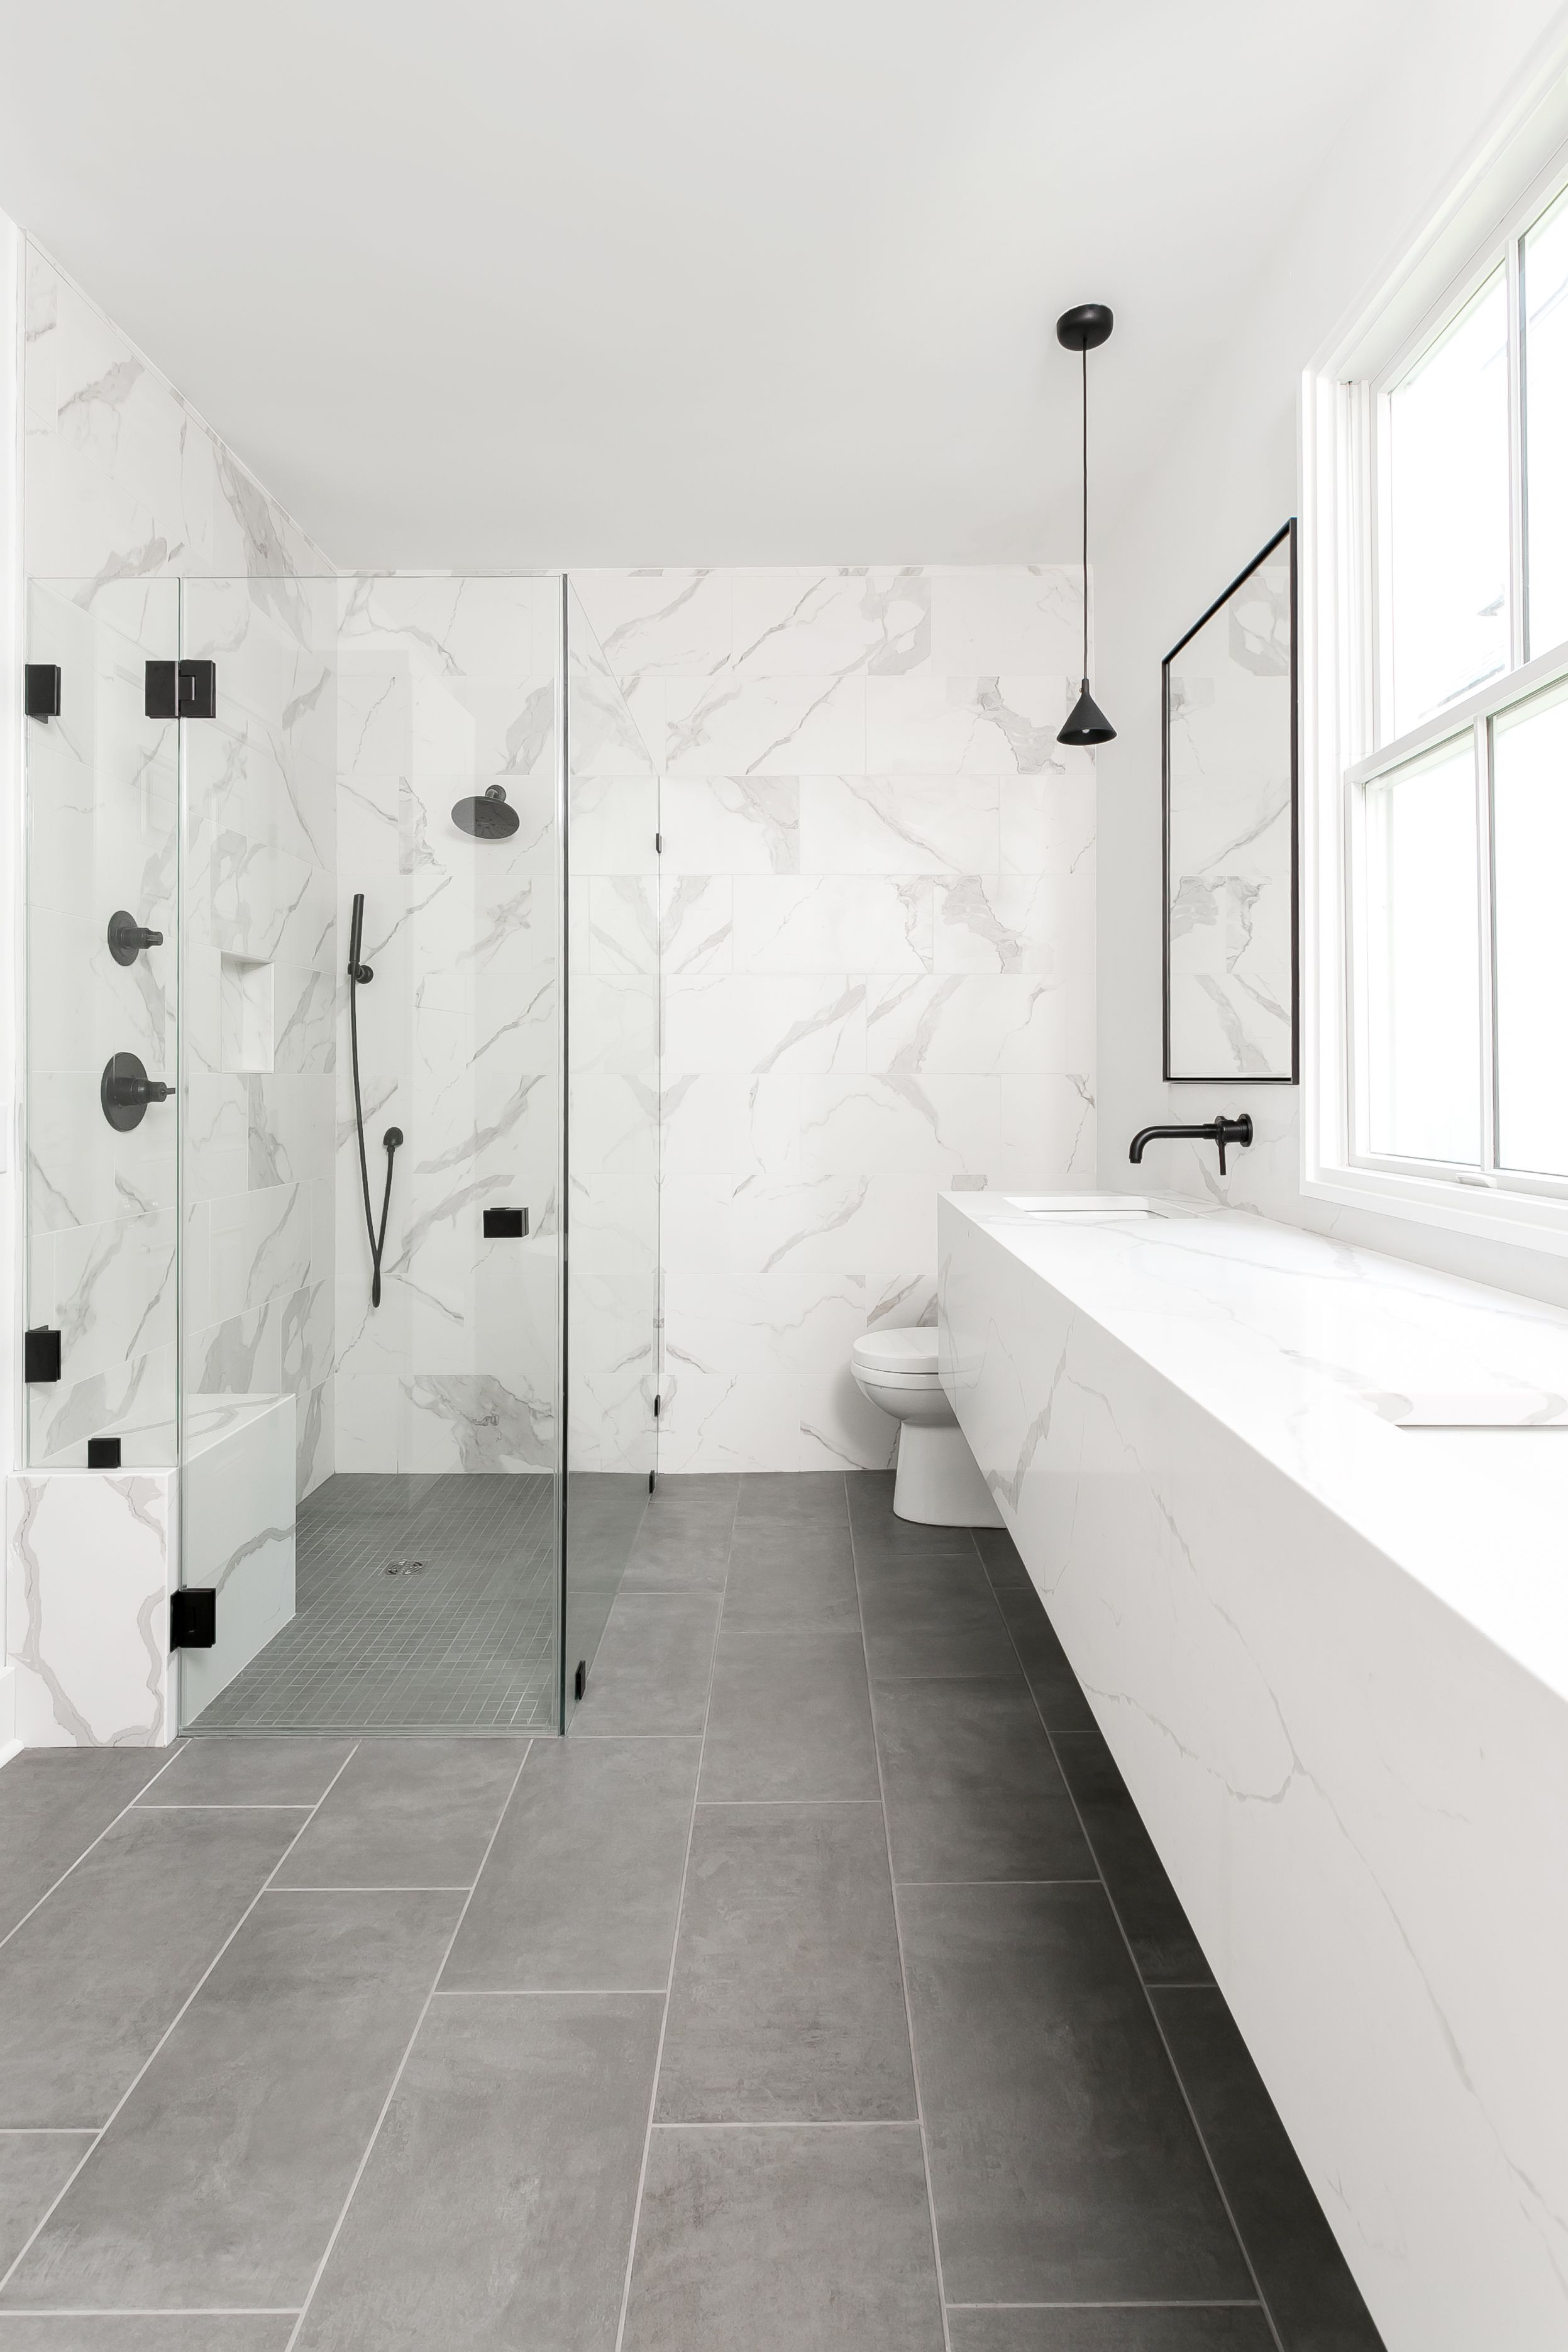 Modern bathroom with quartz floating vanity, matte black wall